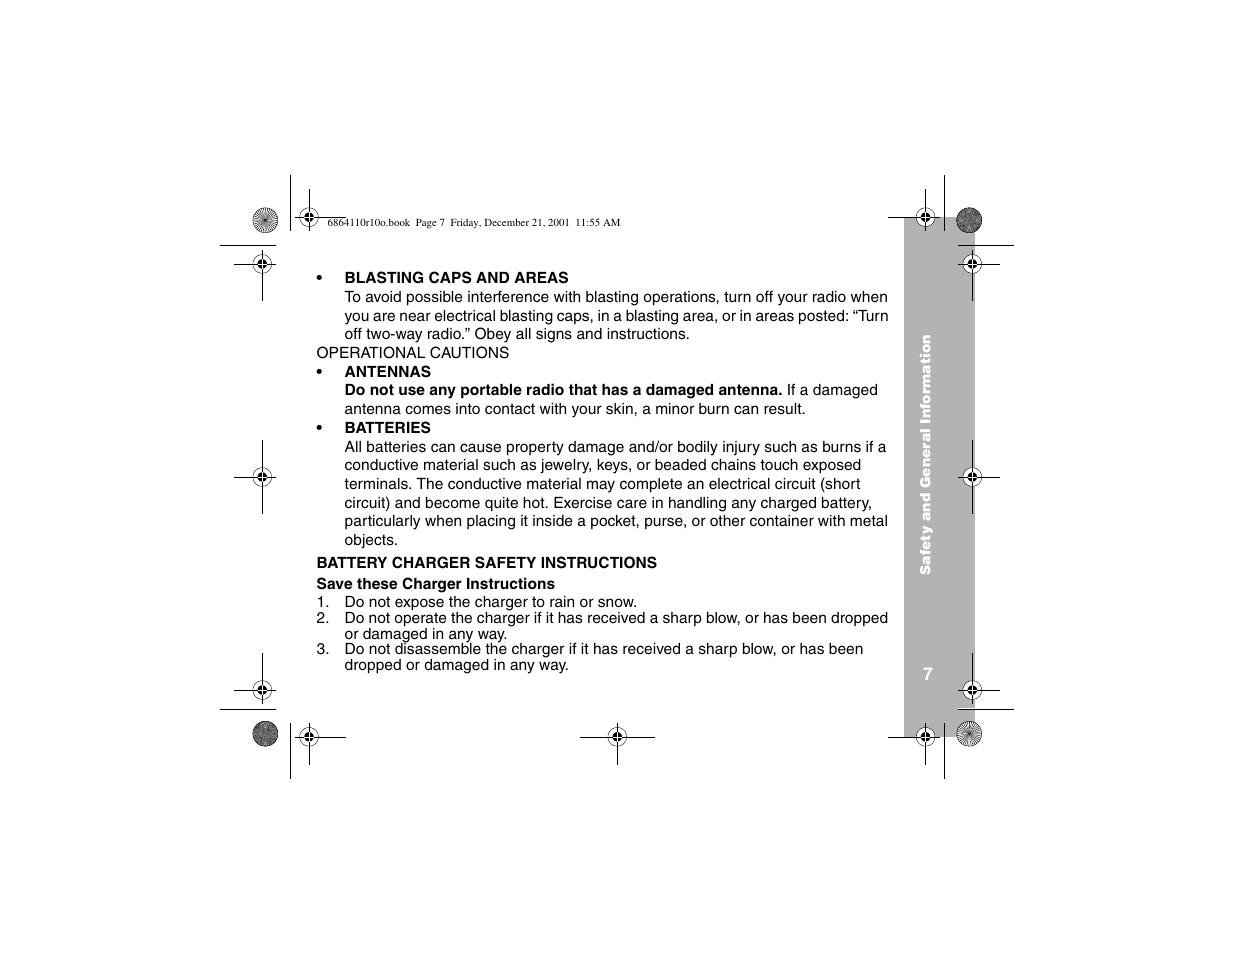 motorola t5410 user manual page 11 40 original mode also for rh manualsdir com Xbox Controller Manual Alcatel One Touch Manual